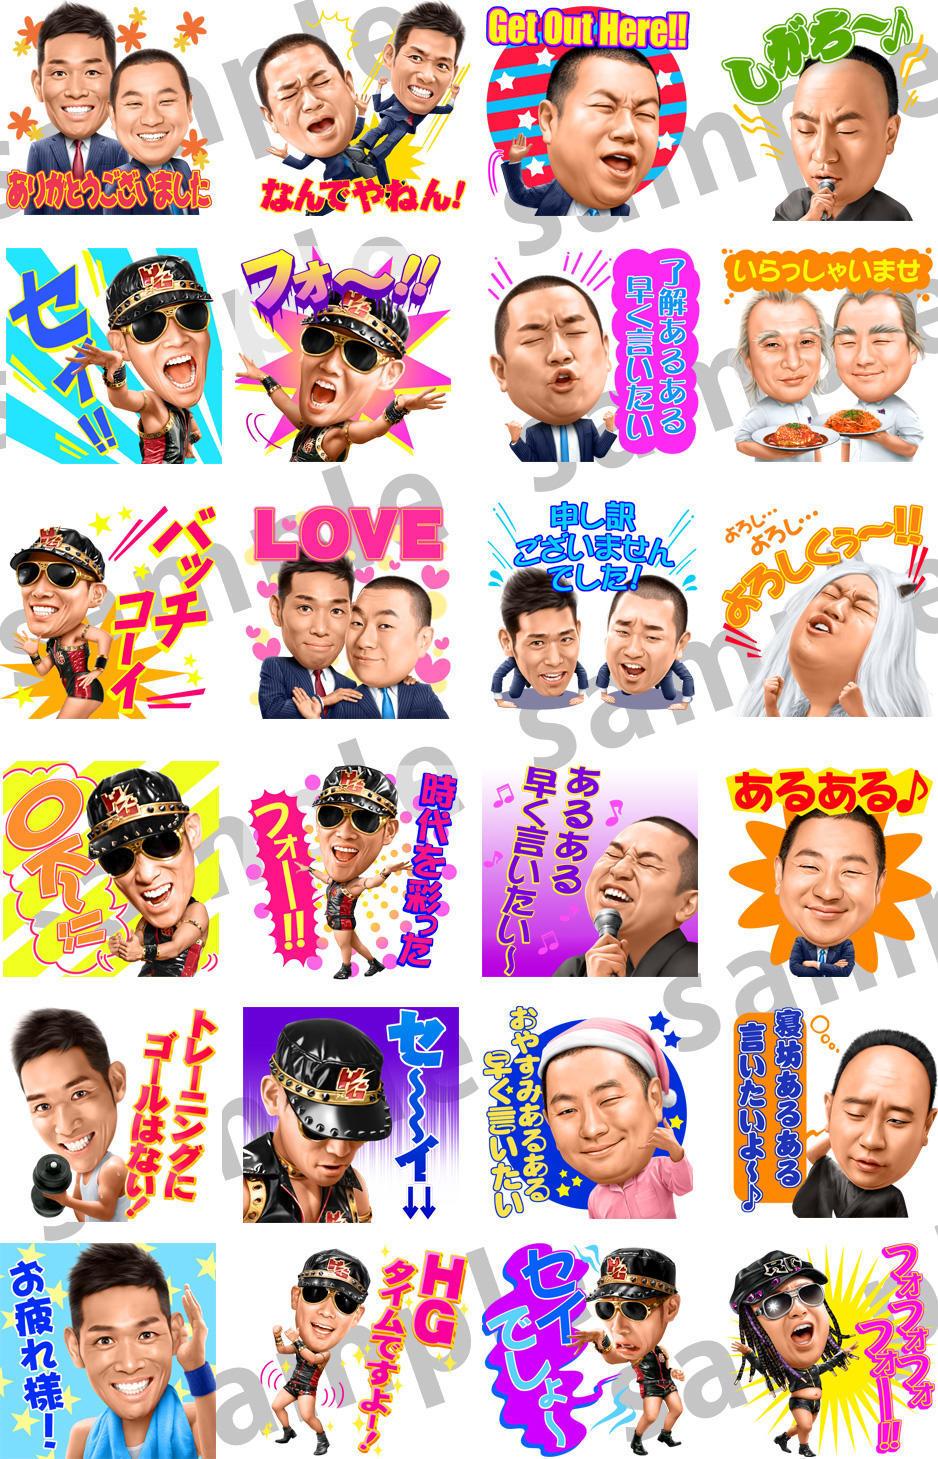 http://news.yoshimoto.co.jp/20170809204734-63d5e43e04dfa14754aad5f5f6626ff20c765aff.jpg